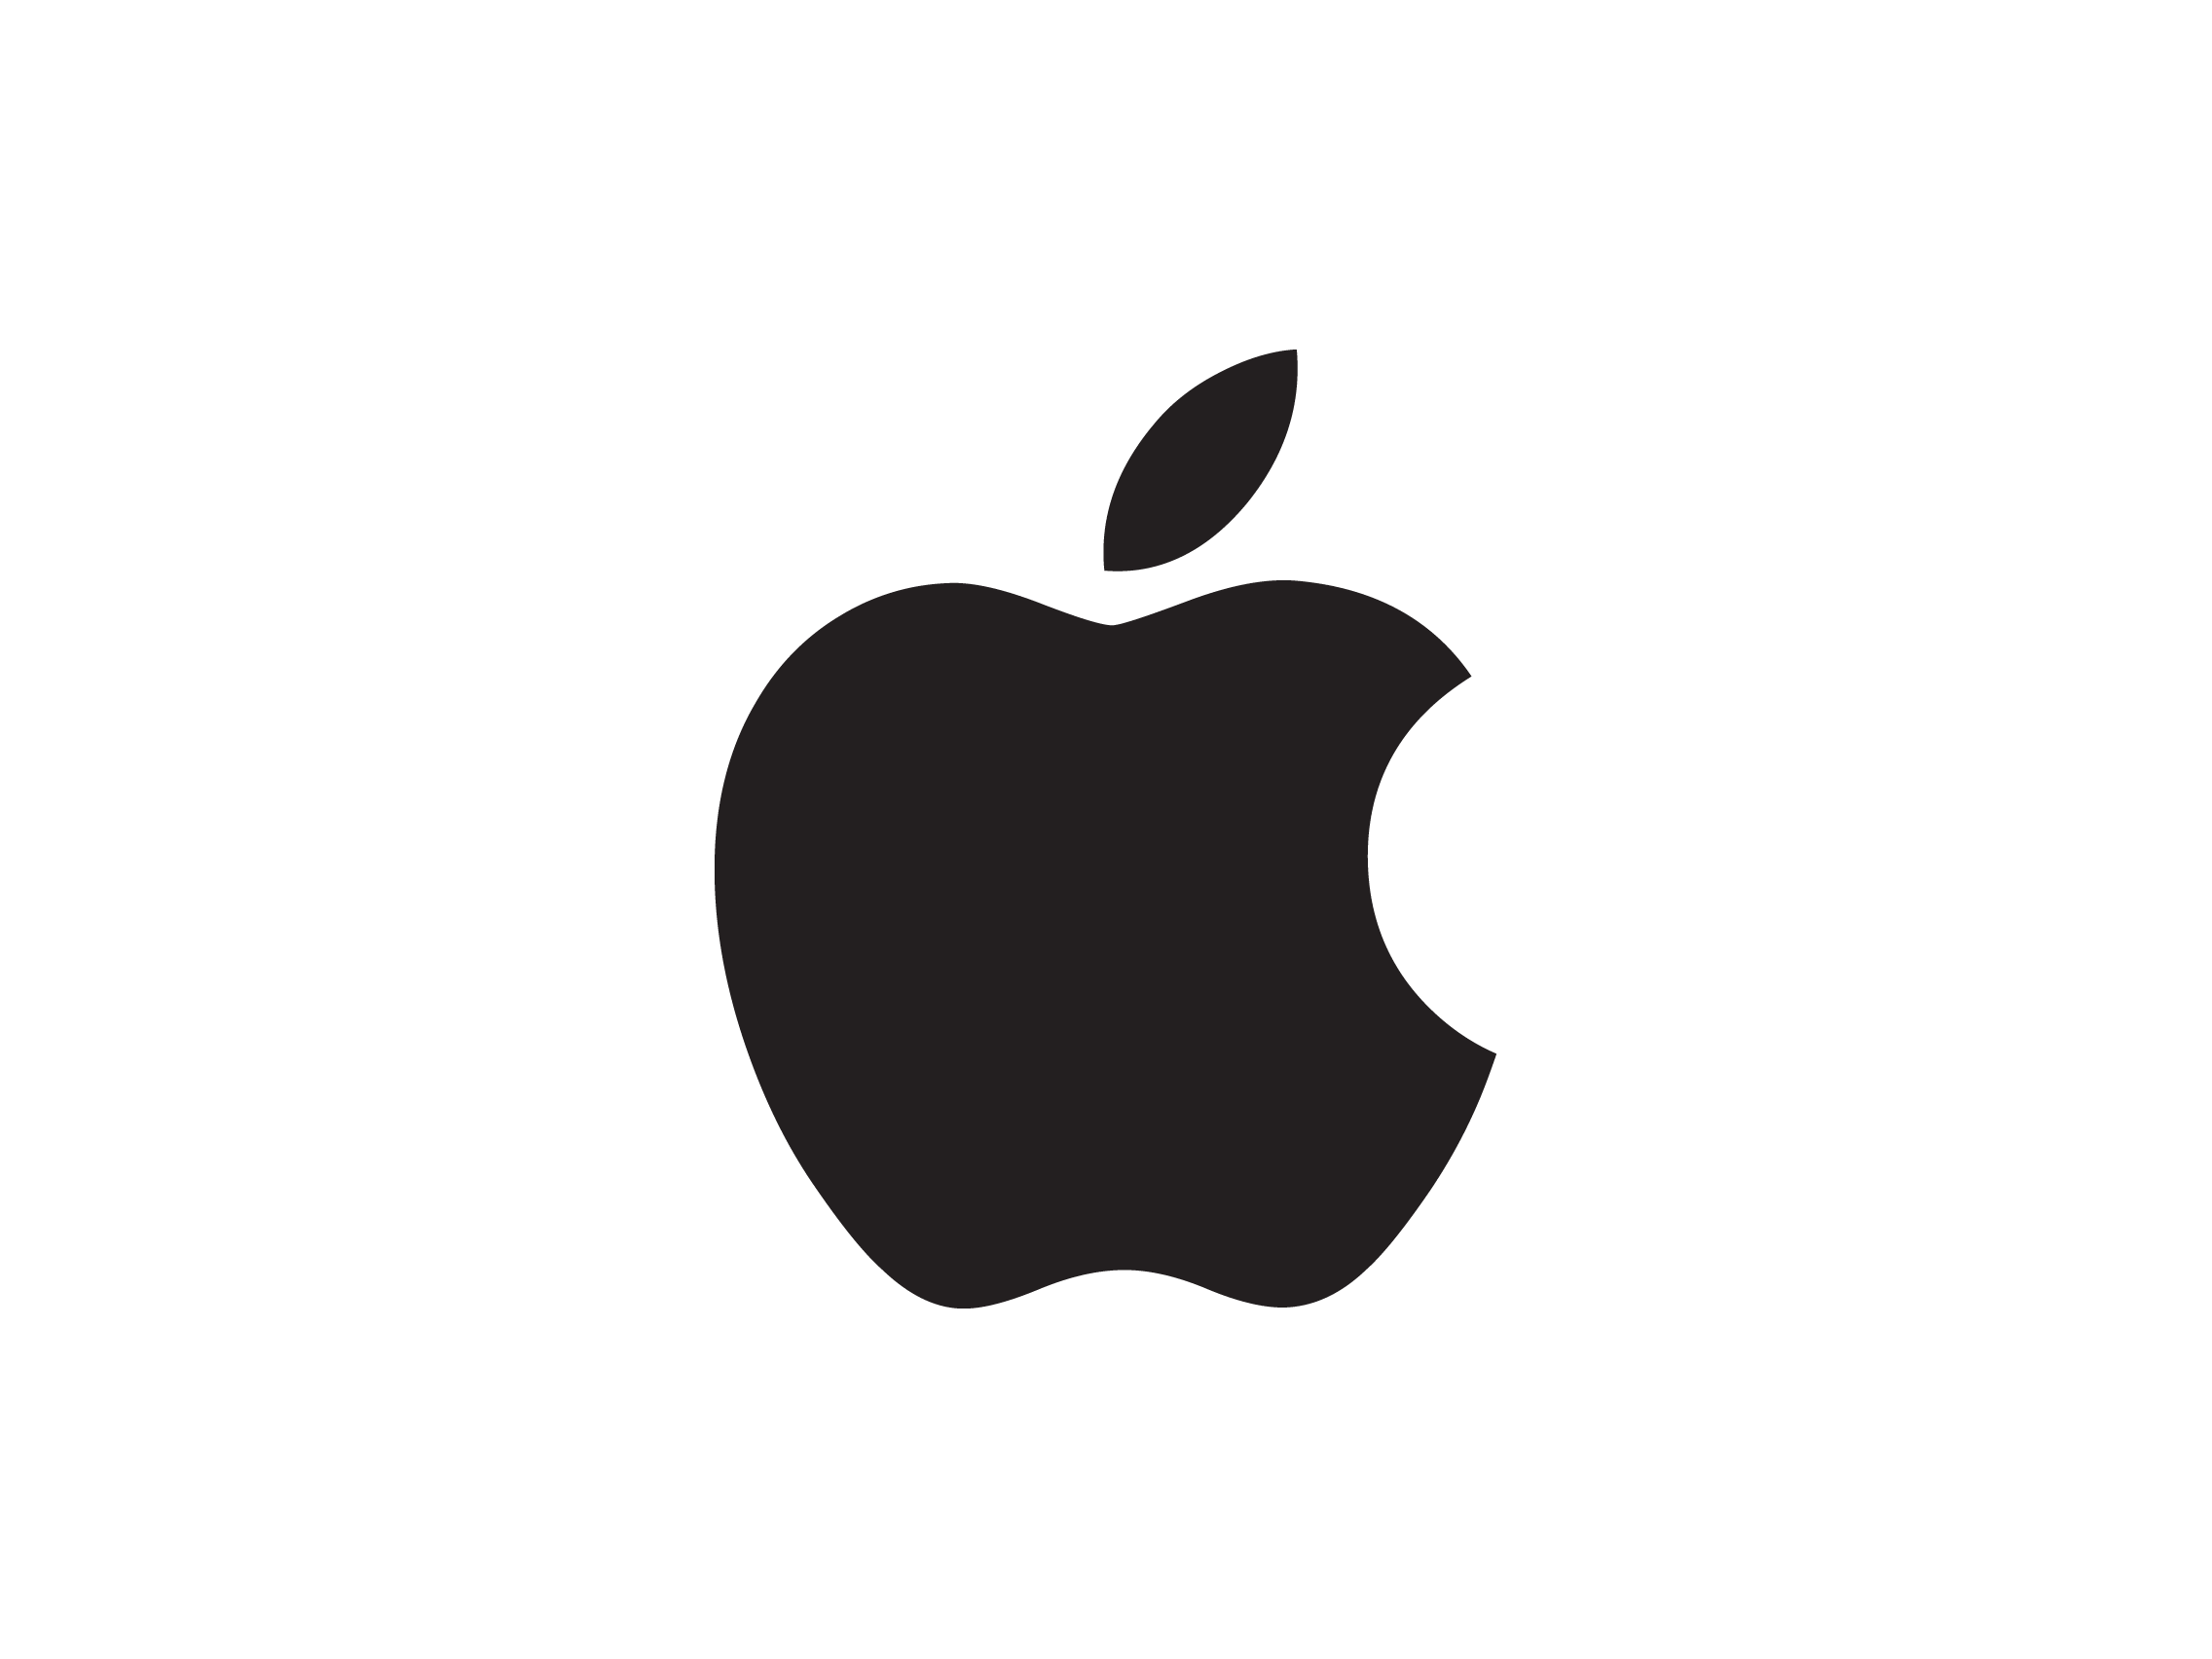 Apple executives gain over $30 million each in vested stock bonus